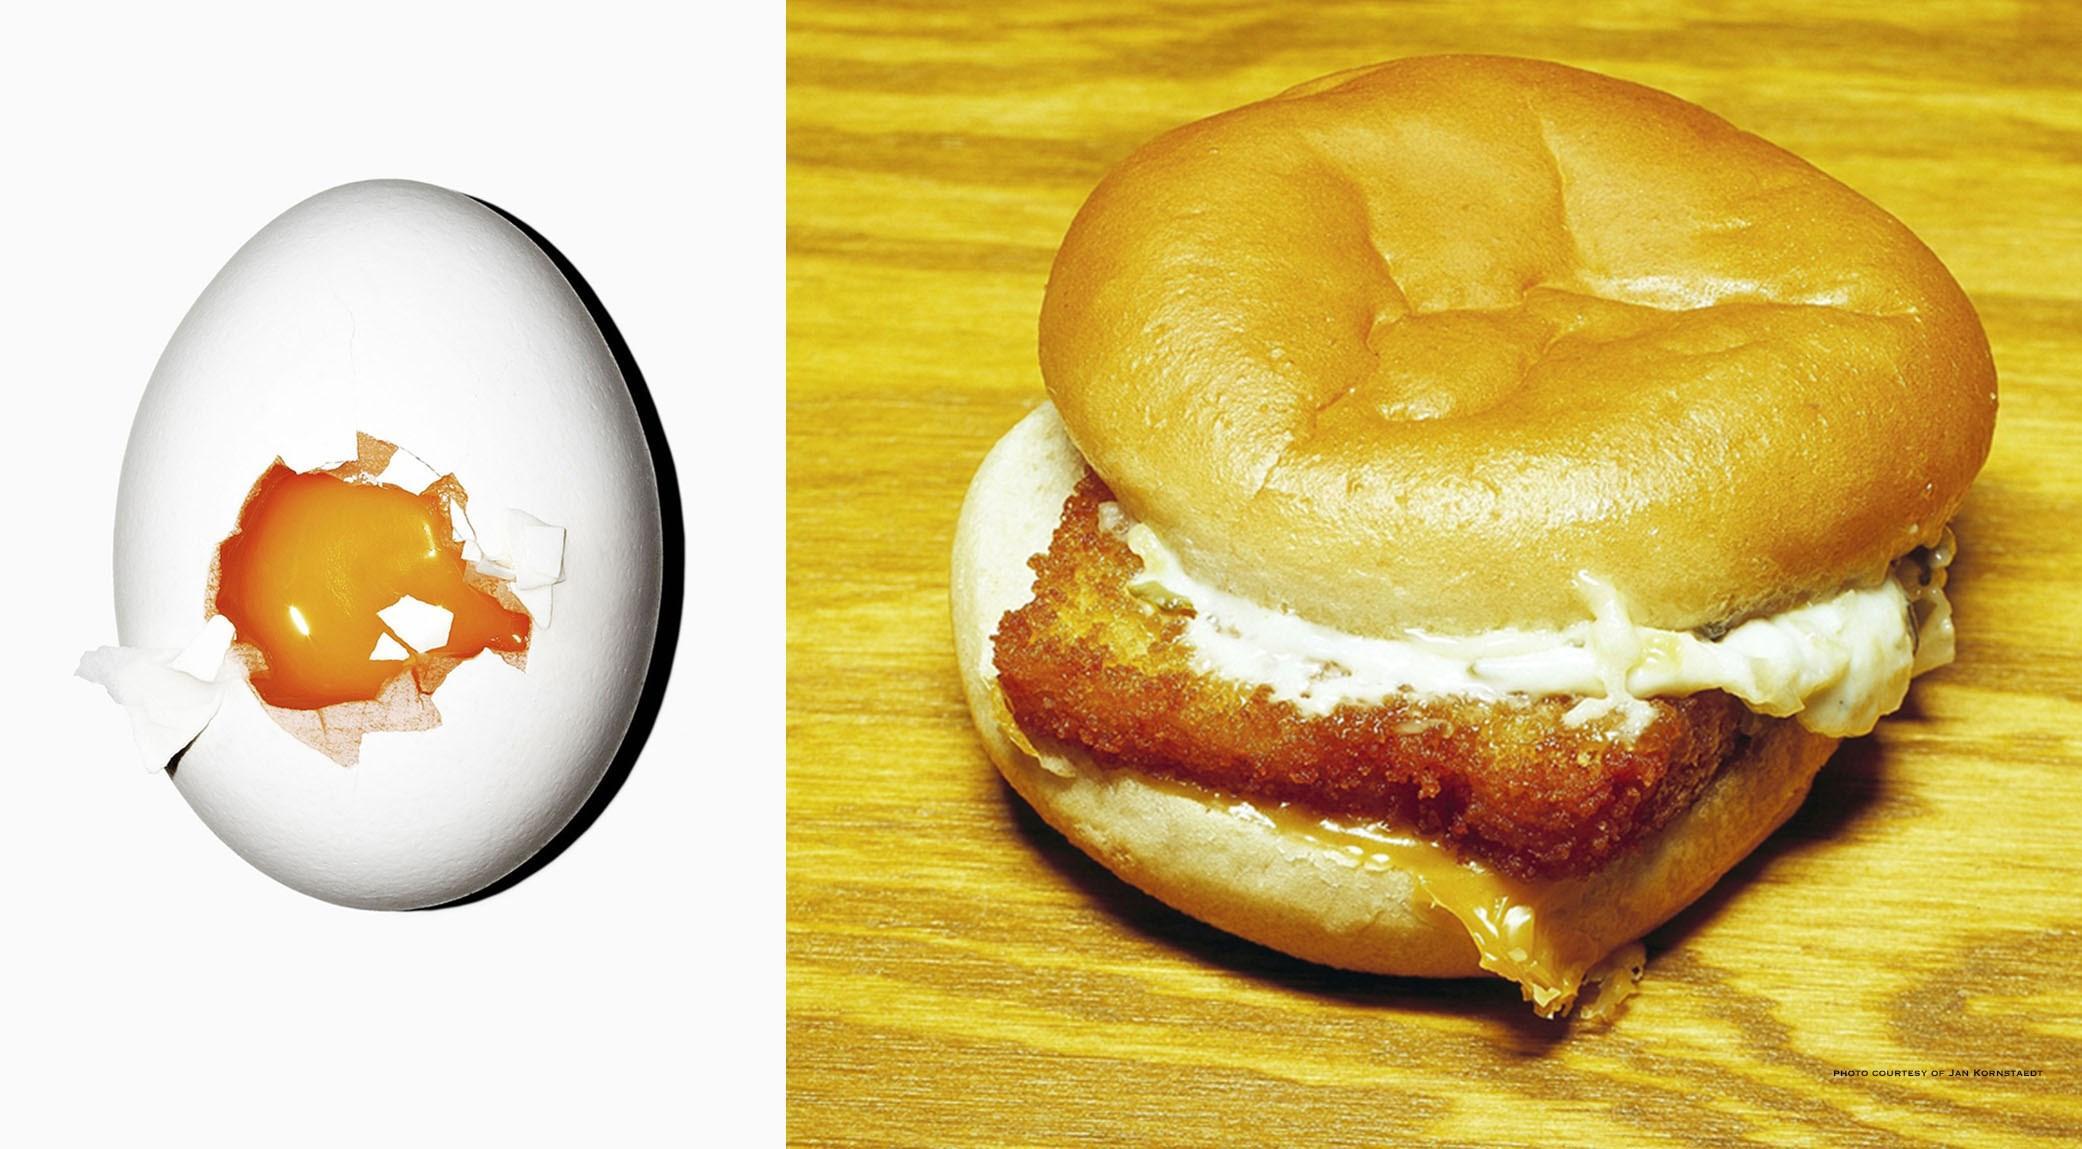 Oeuf et sandwich